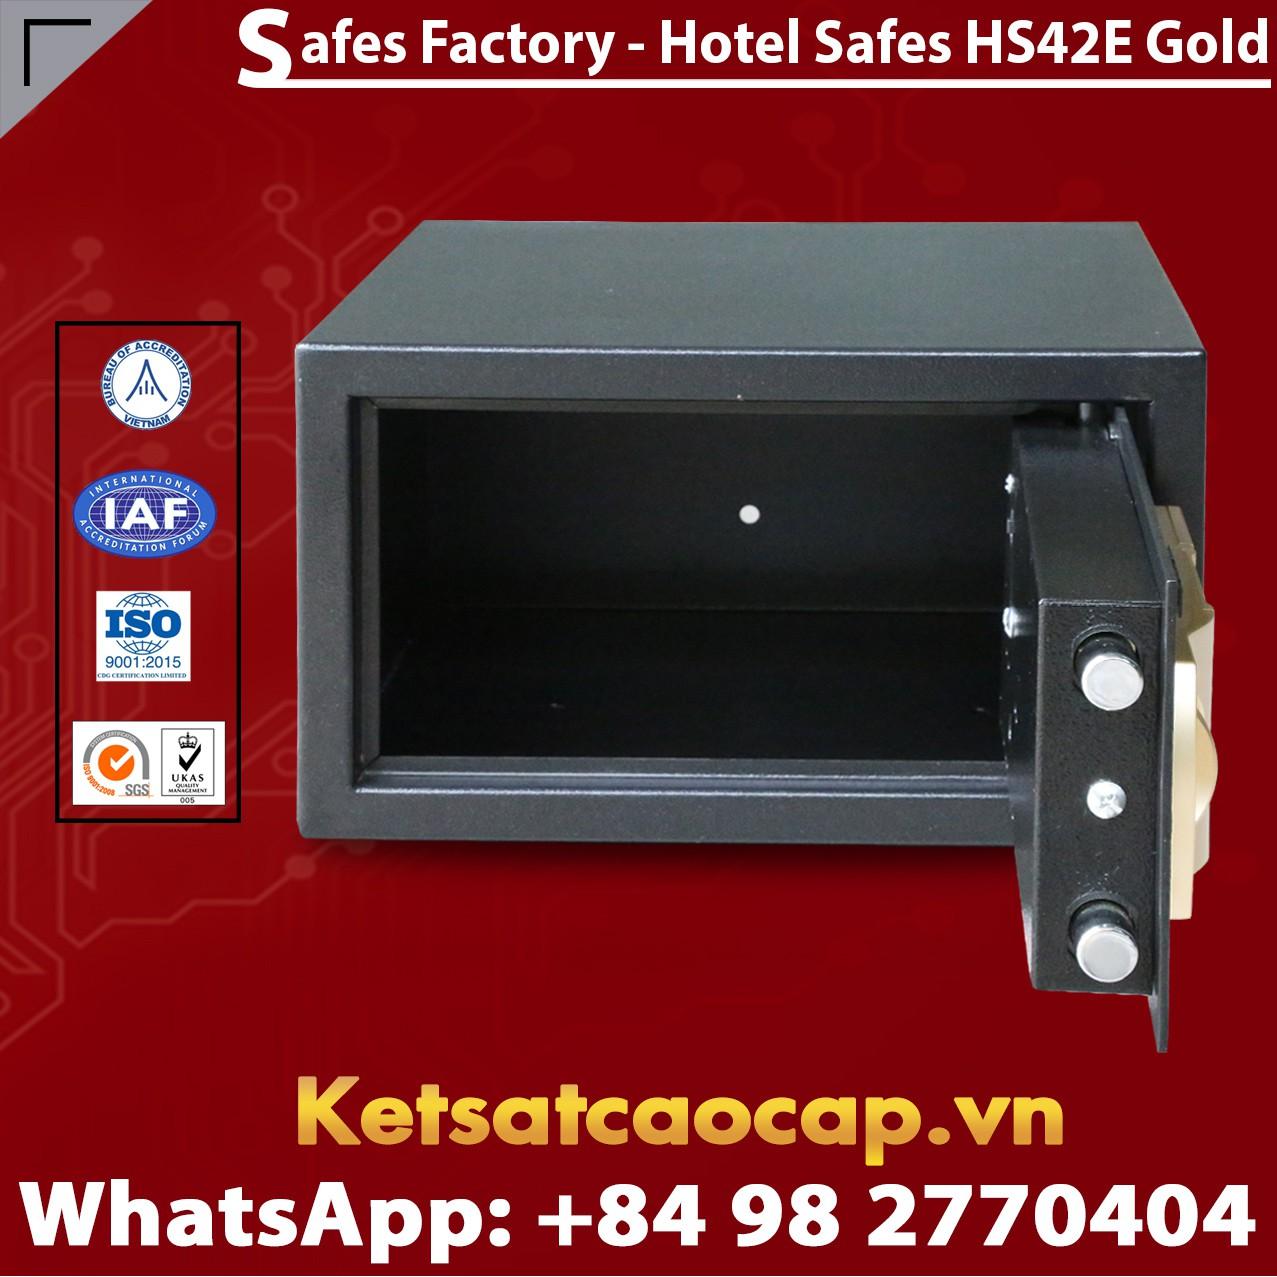 Hotel Safe HOMESUN